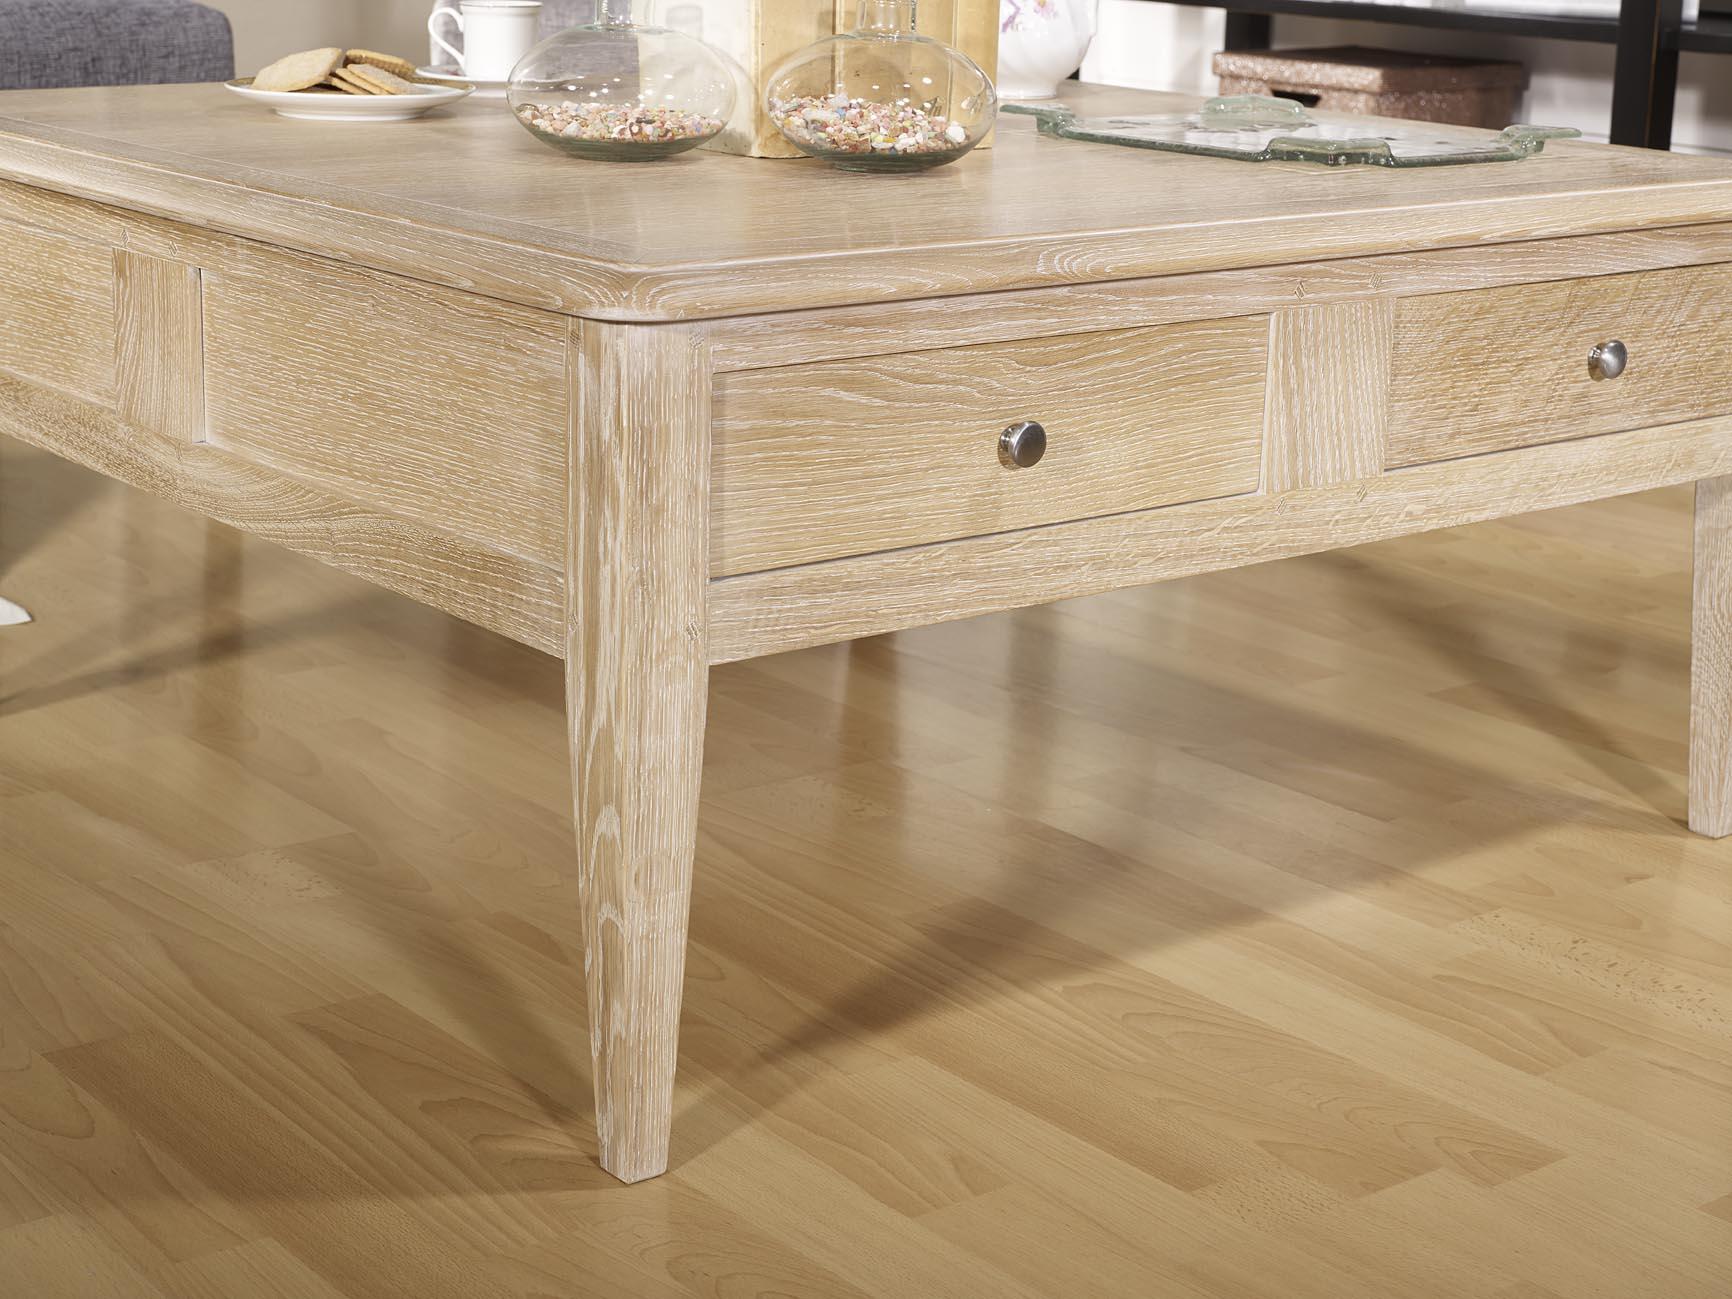 table basse carr e justin em ch ne de style directoire meuble en ch ne massif. Black Bedroom Furniture Sets. Home Design Ideas